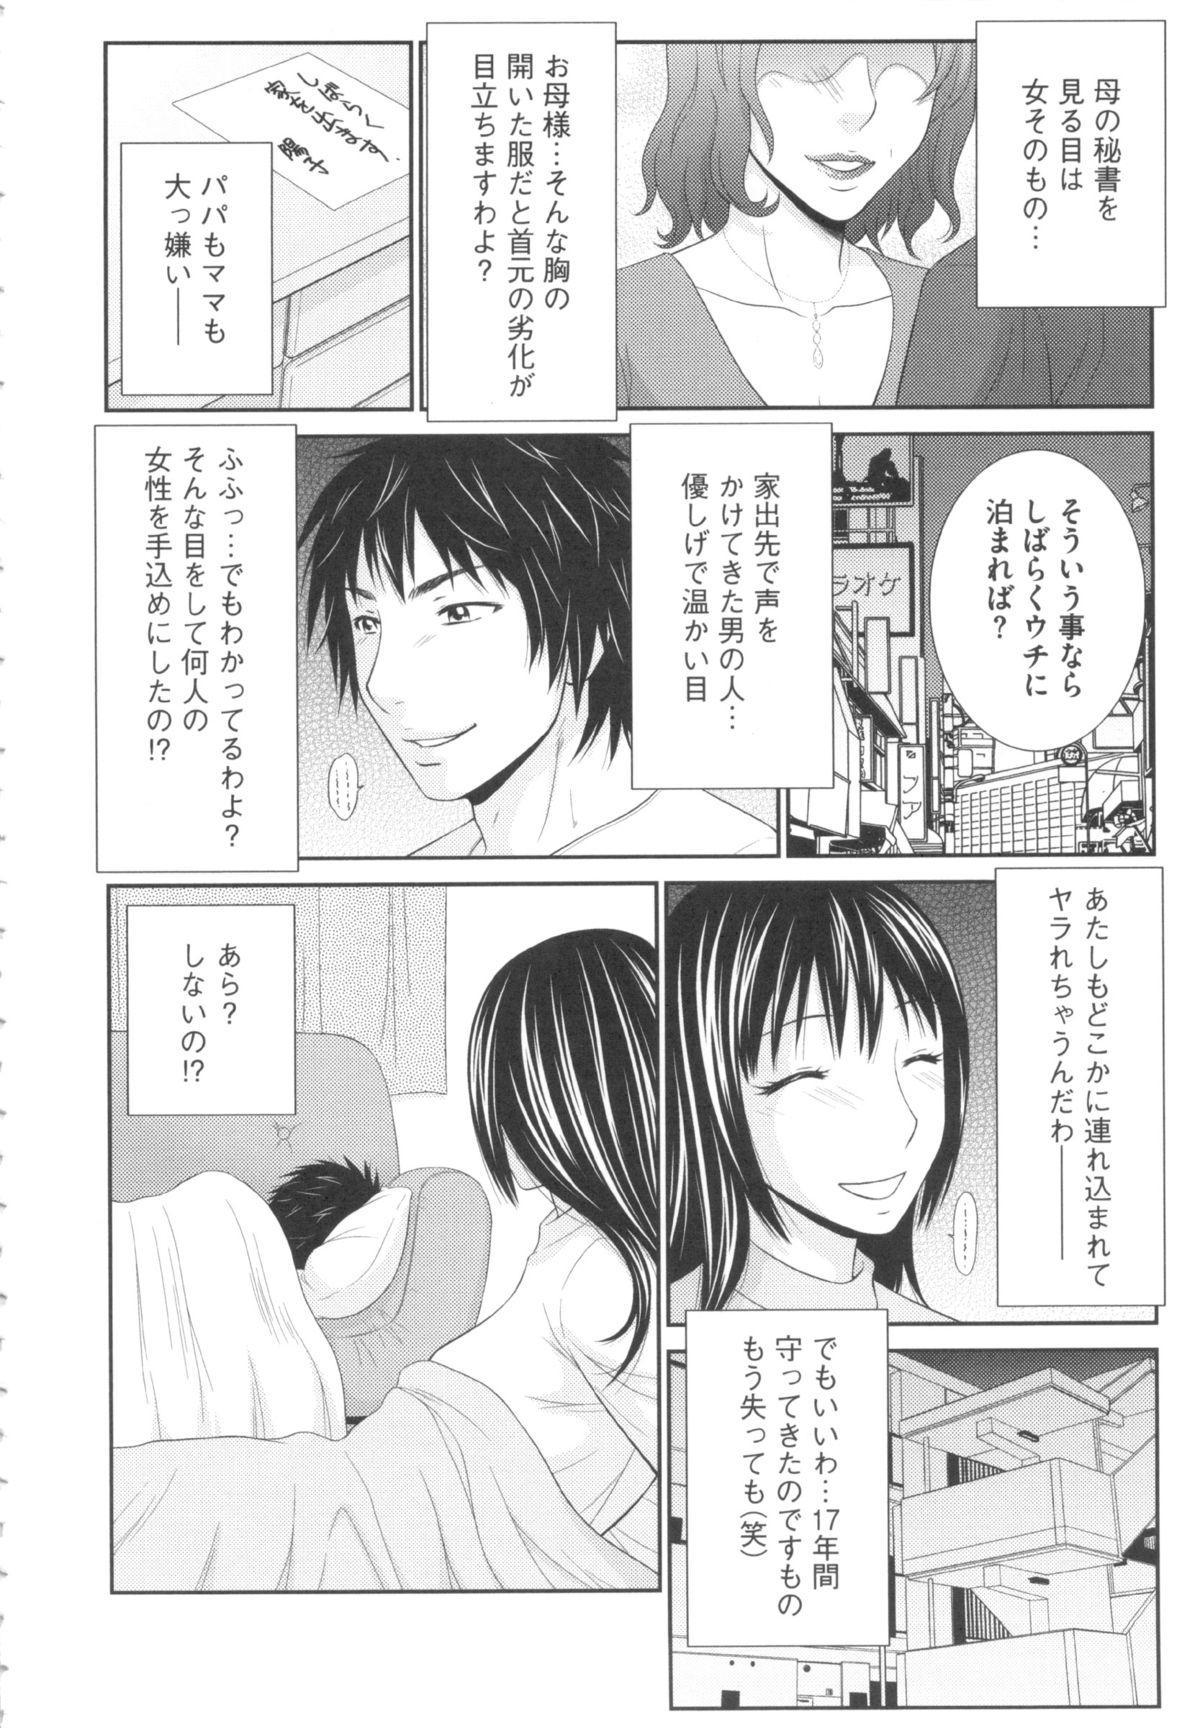 Kiseki No Zaajiru - Sperm of Miracle 180